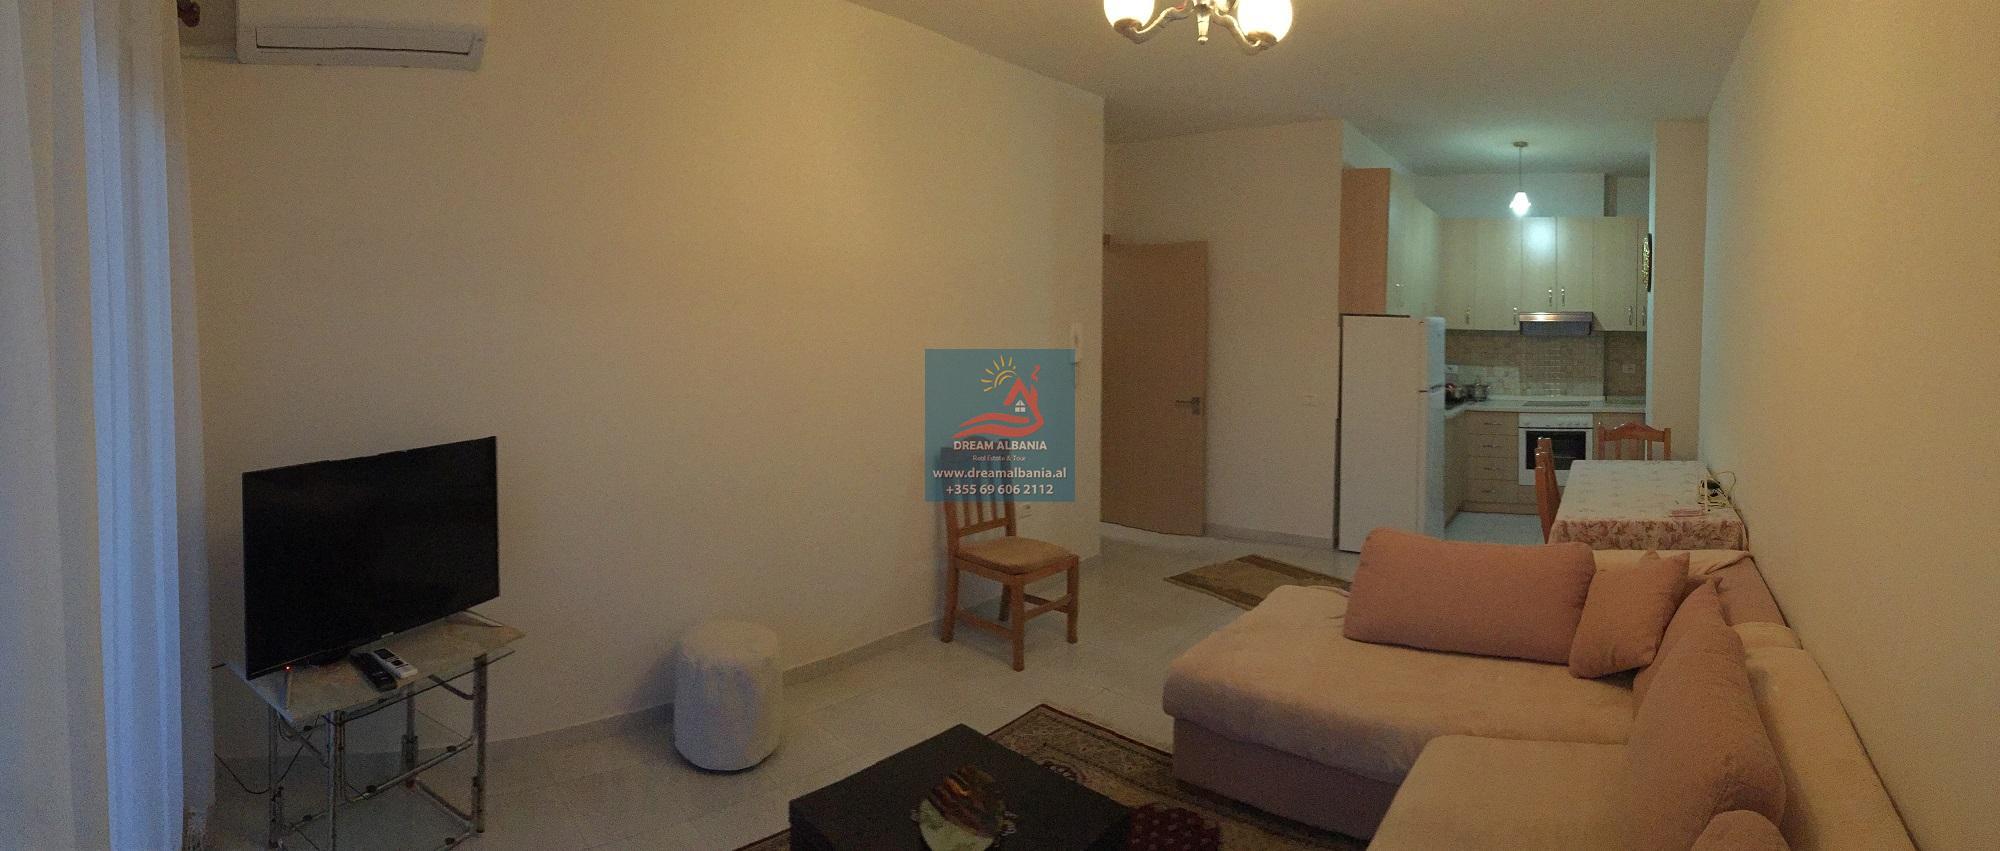 Jepet me qera Apartament 1+1 ne zonen Don Bosko tek Kompleksi Panorama Tirane ID 4211124